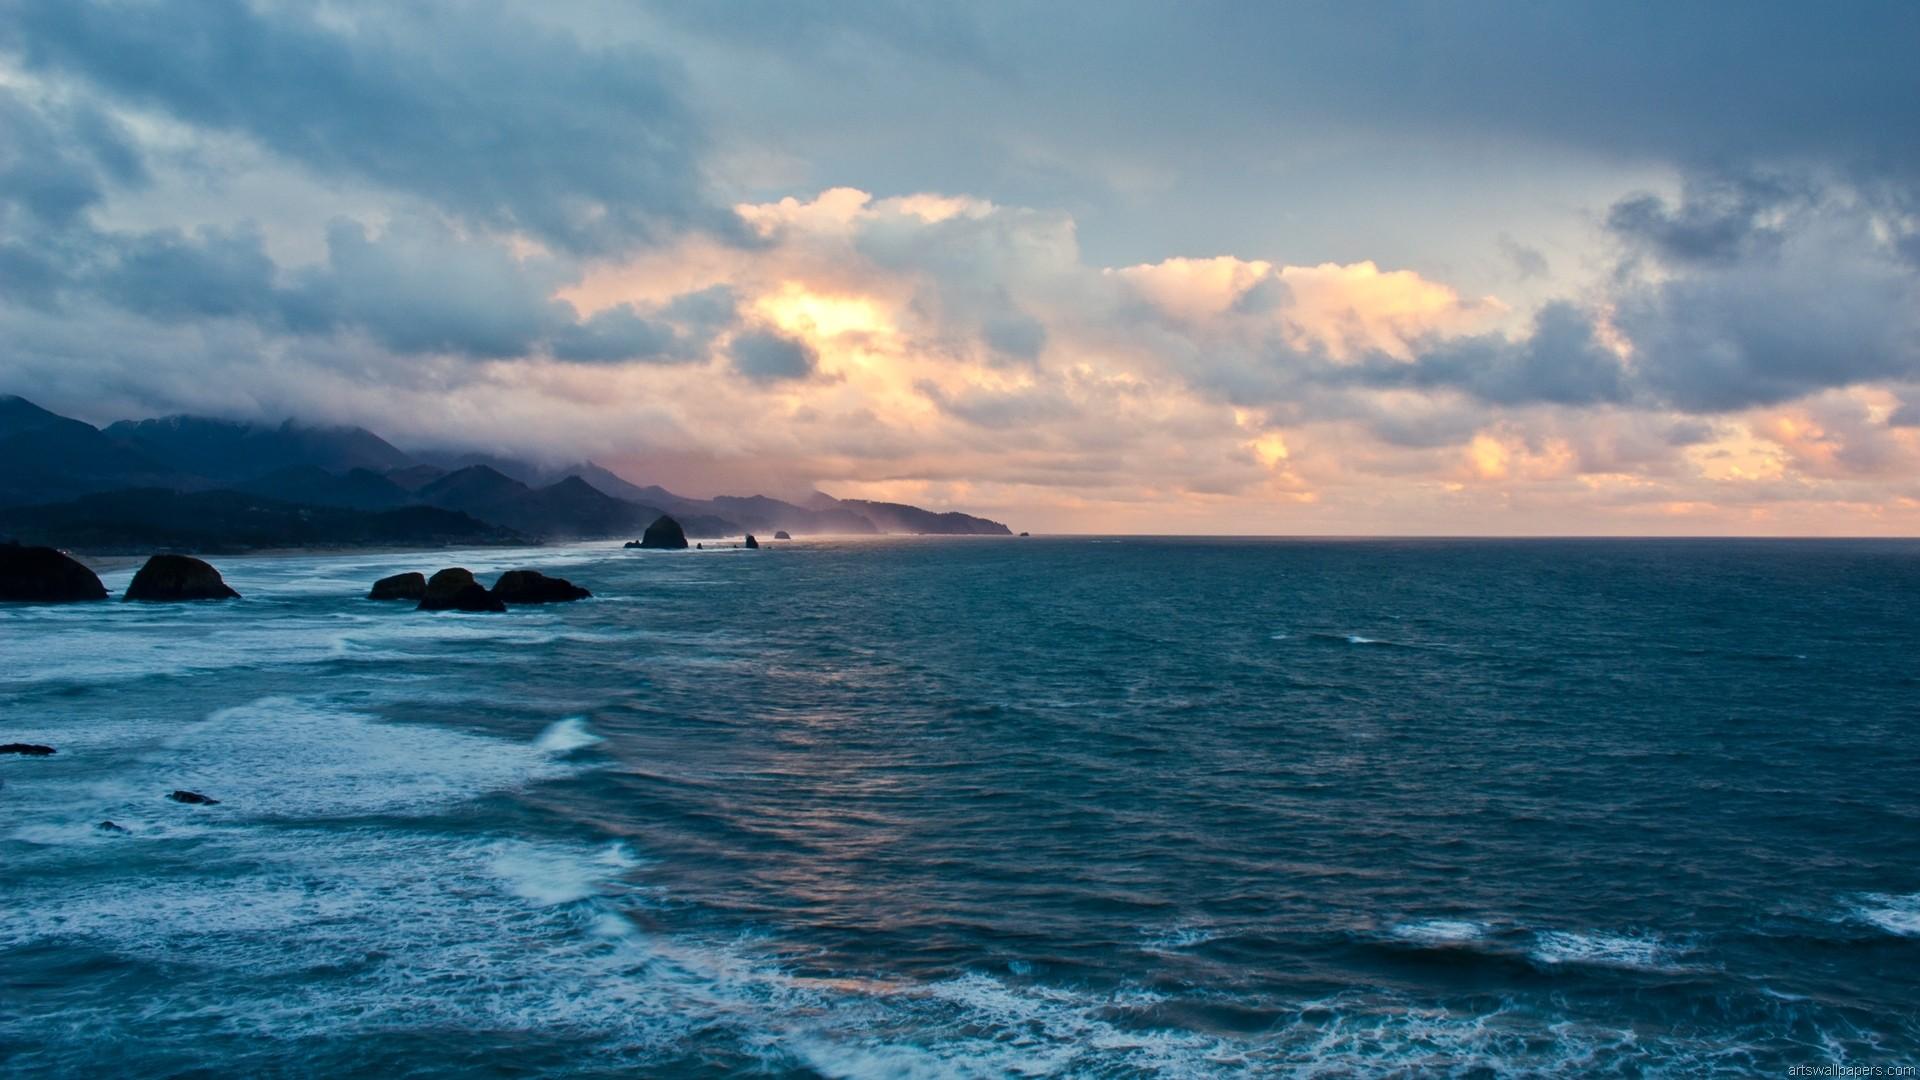 Sea Ocean Wallpaper, HD, Full HD 1080p, Desktop Wallpaper, Background .